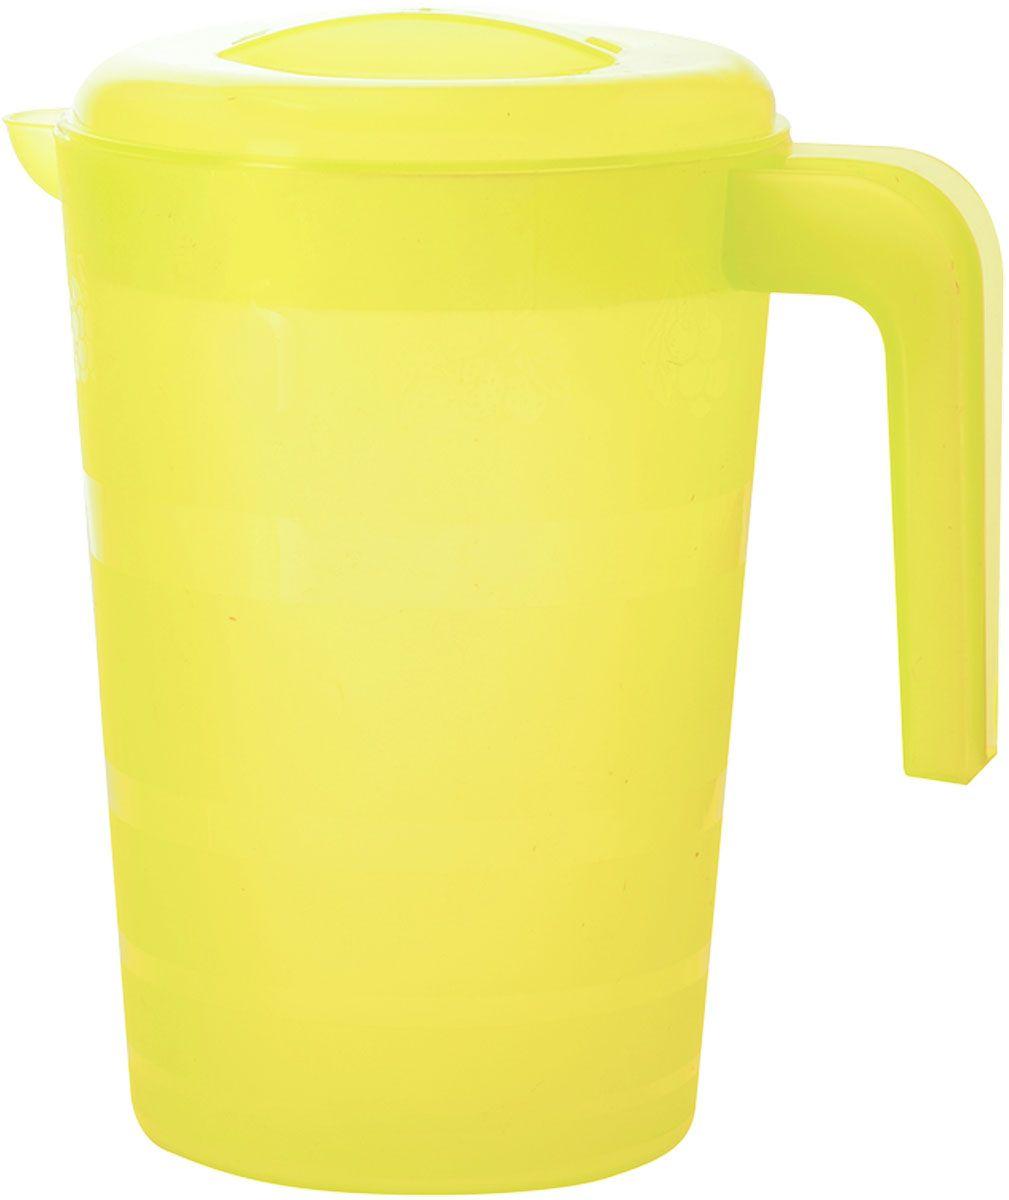 Кувшин Plastic Centre Фазенда, с крышкой, цвет: желтый, 2 л кувшин plastic centre сфера цвет светло зеленый прозрачный 2 л